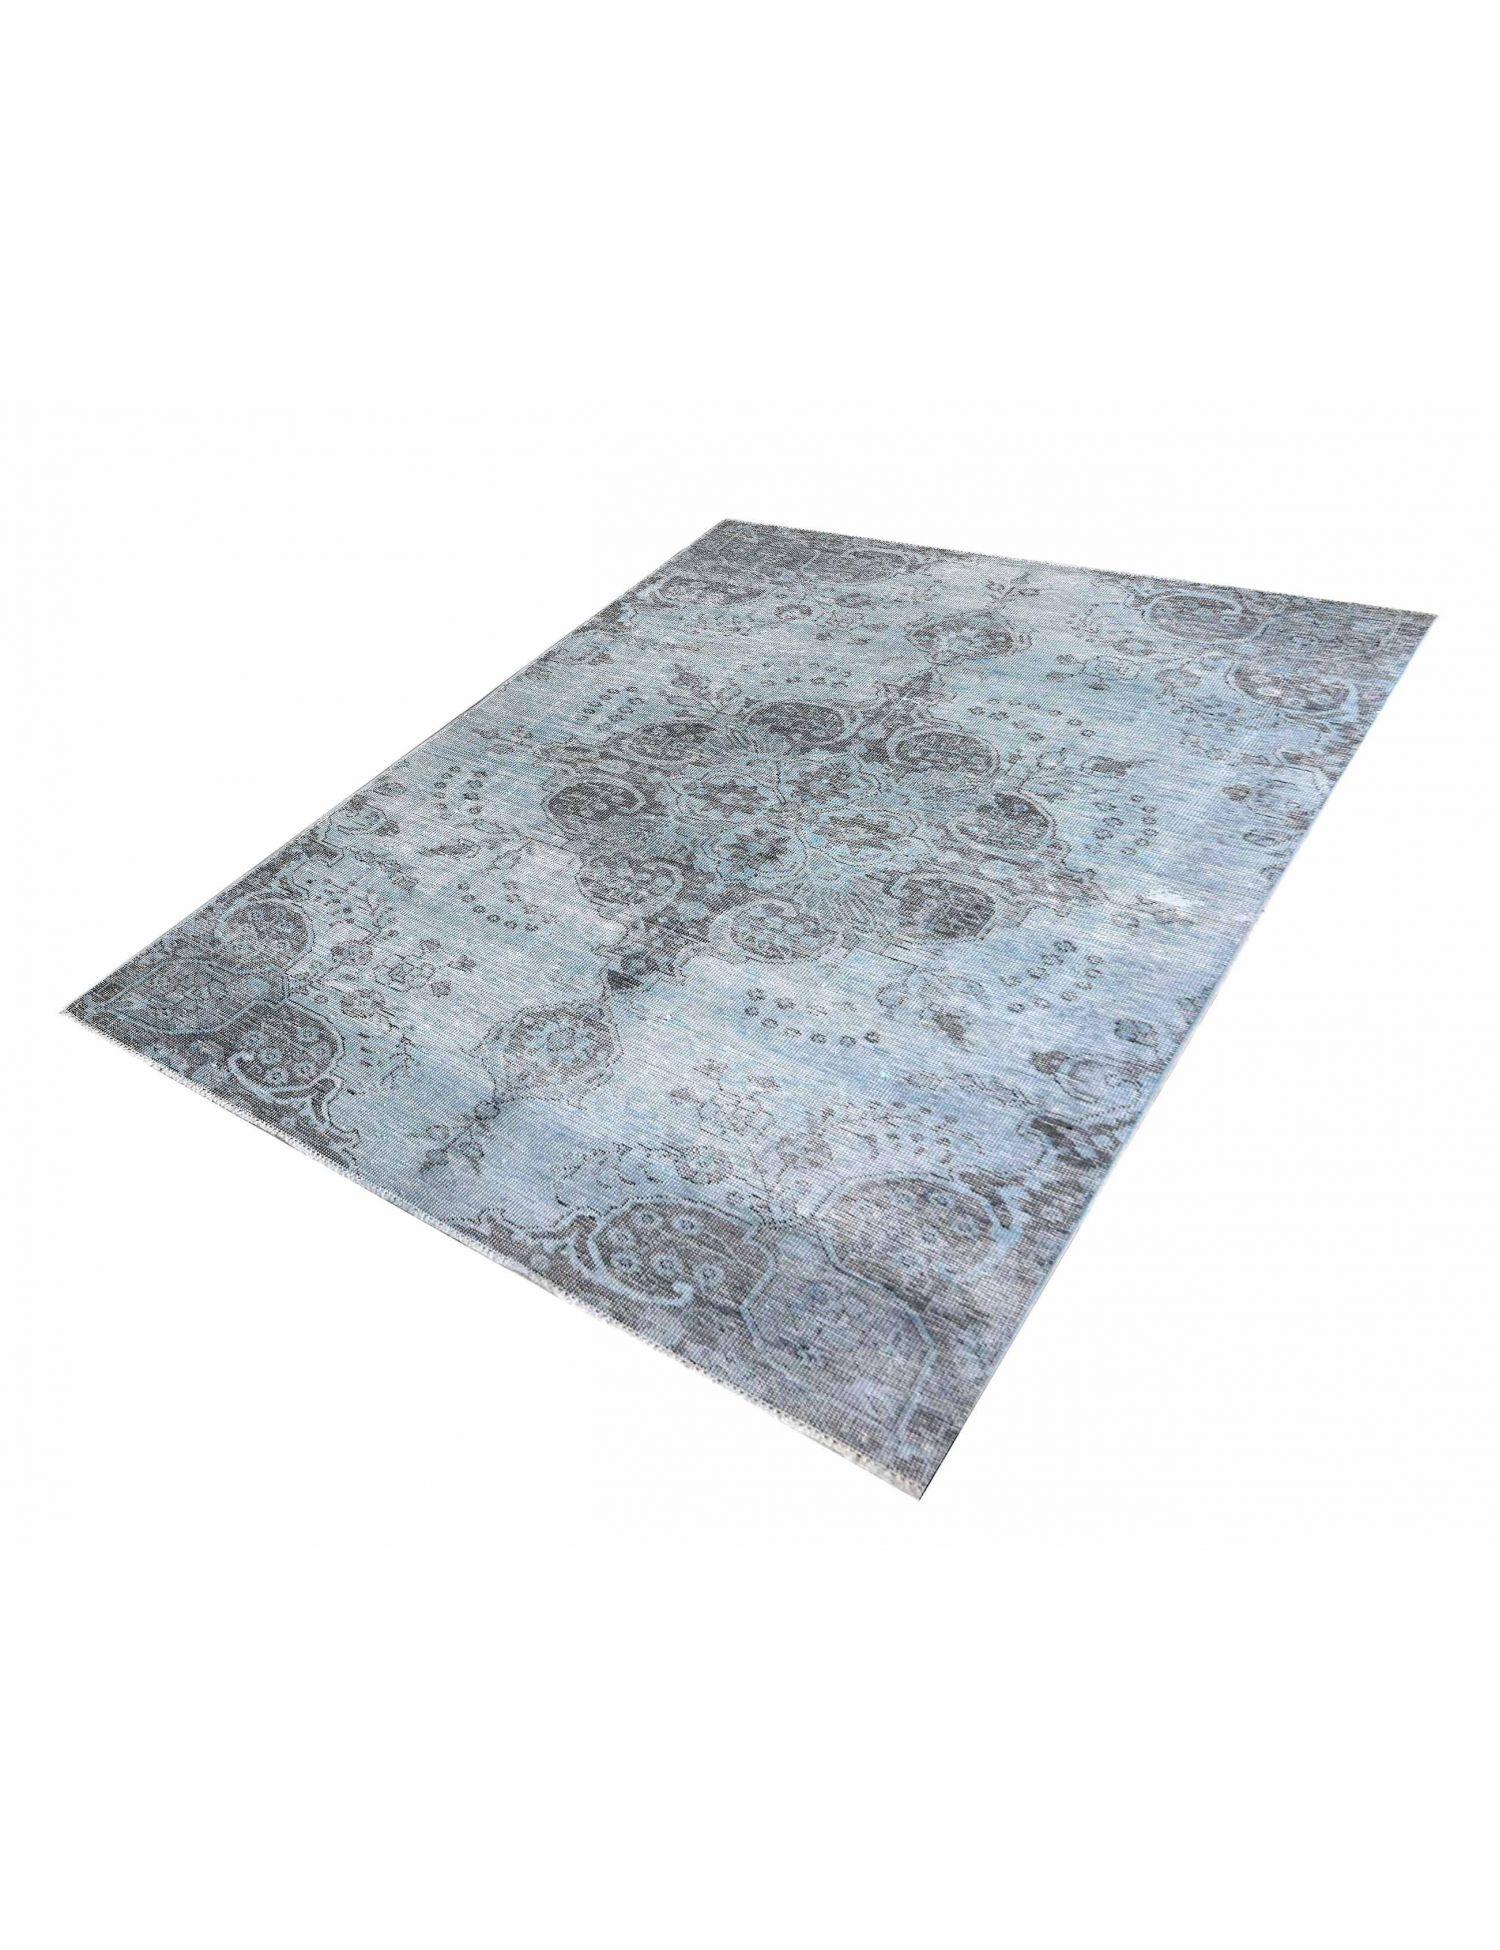 Vintage Perserteppich  grau <br/>219 x 135 cm